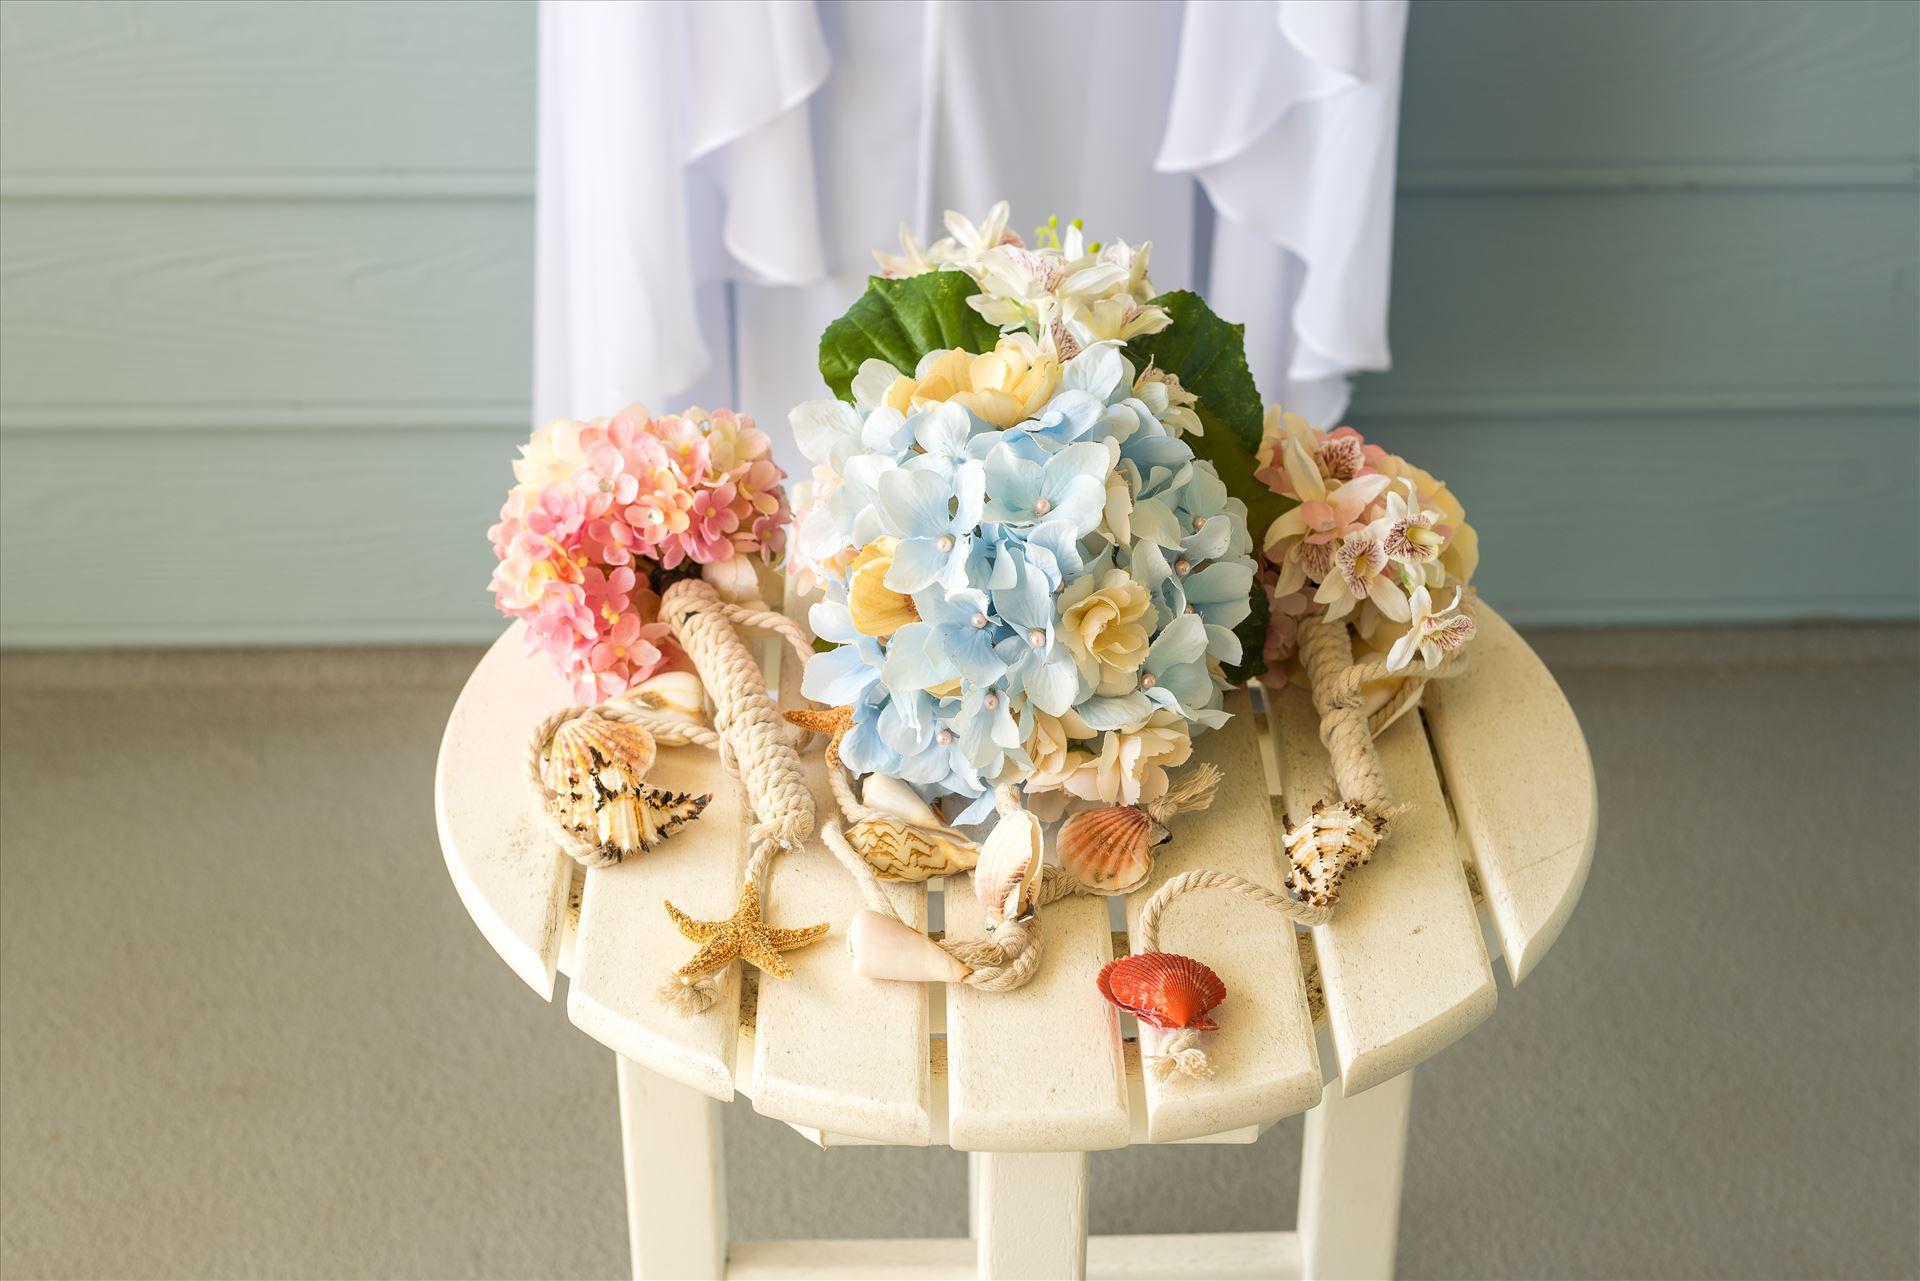 Ross Beach Wedding 02  by Sarah Williams